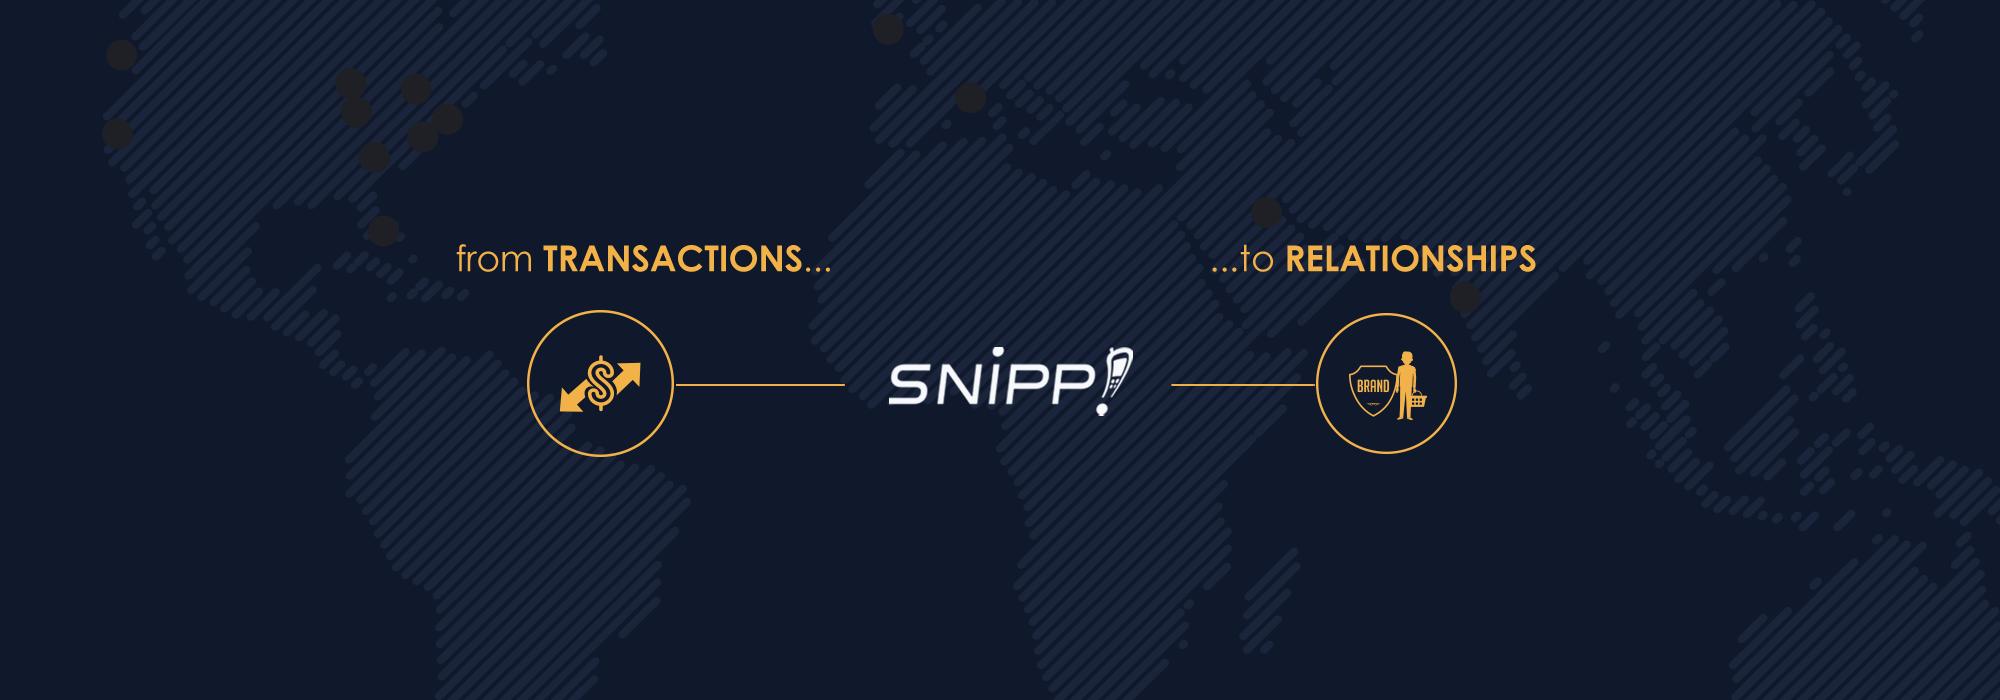 Snipp Contact Us